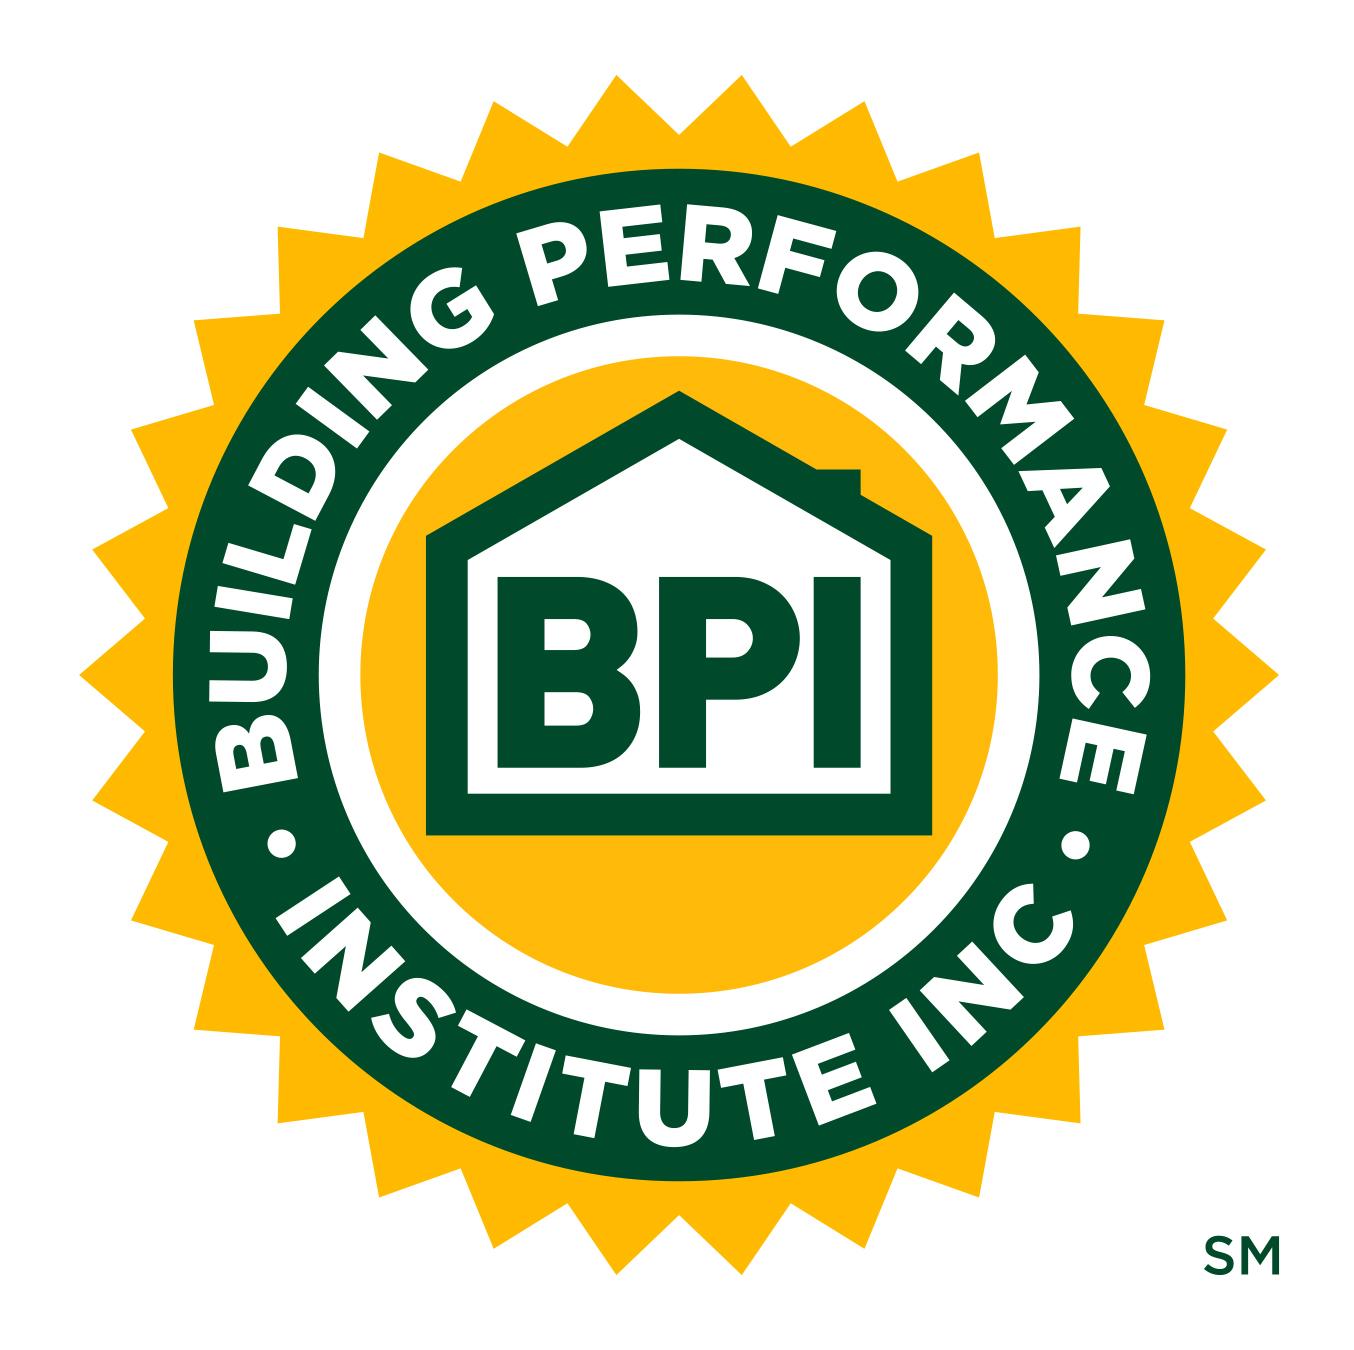 http://bpi.org/sites/default/files/logo